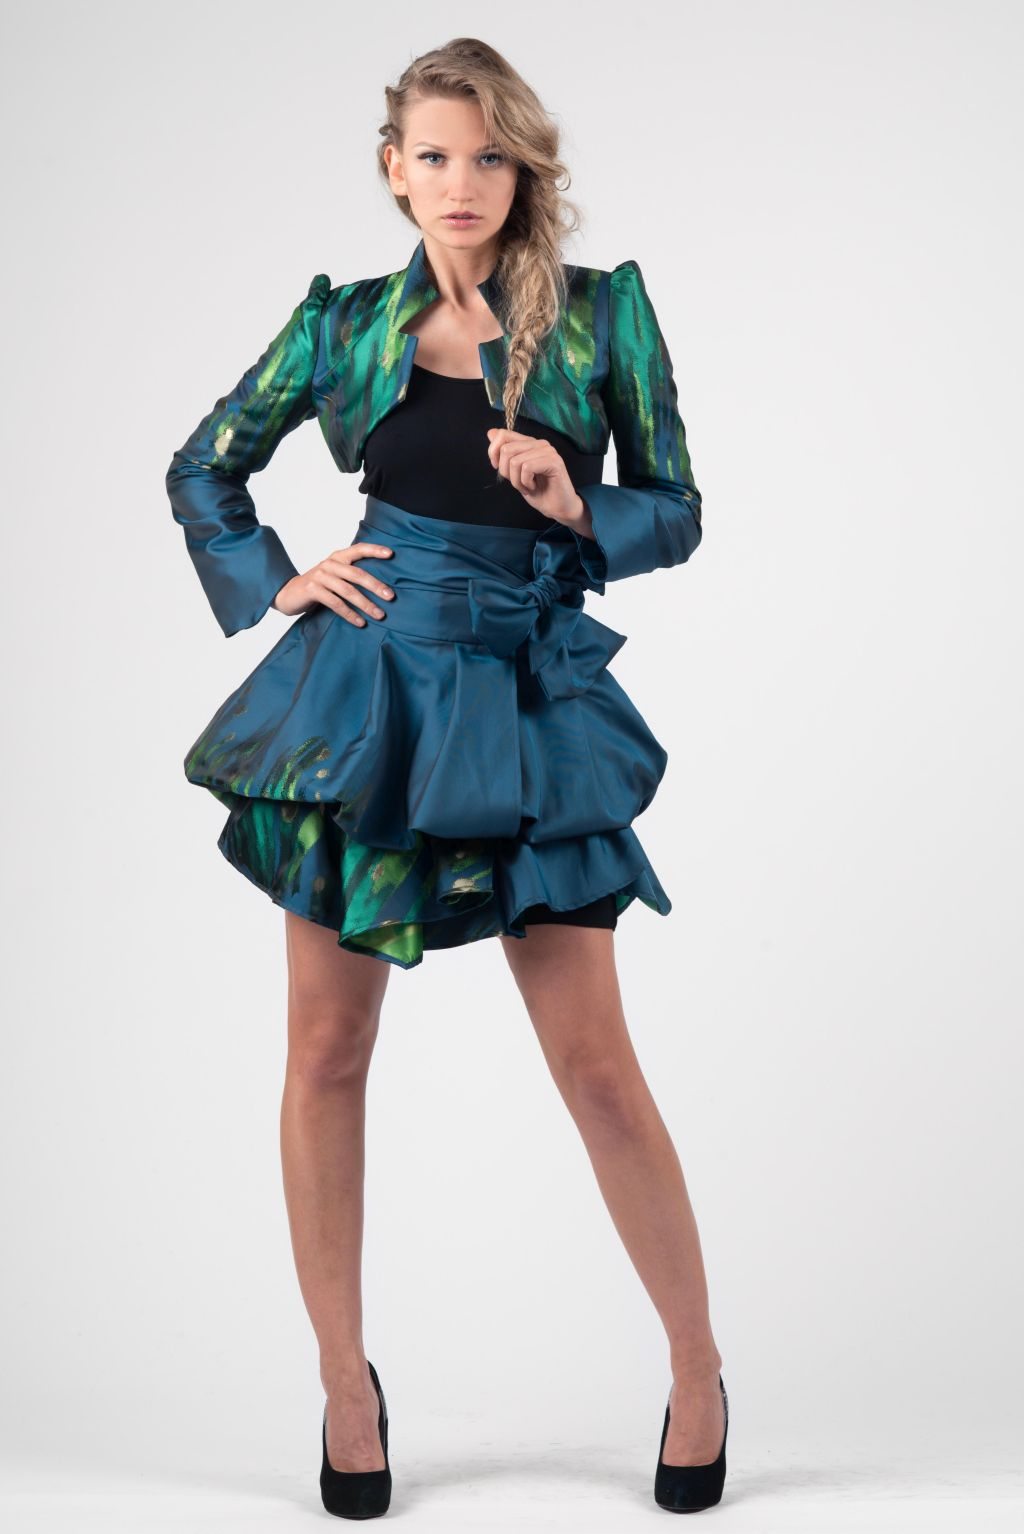 Yana Martens modelling Workshops